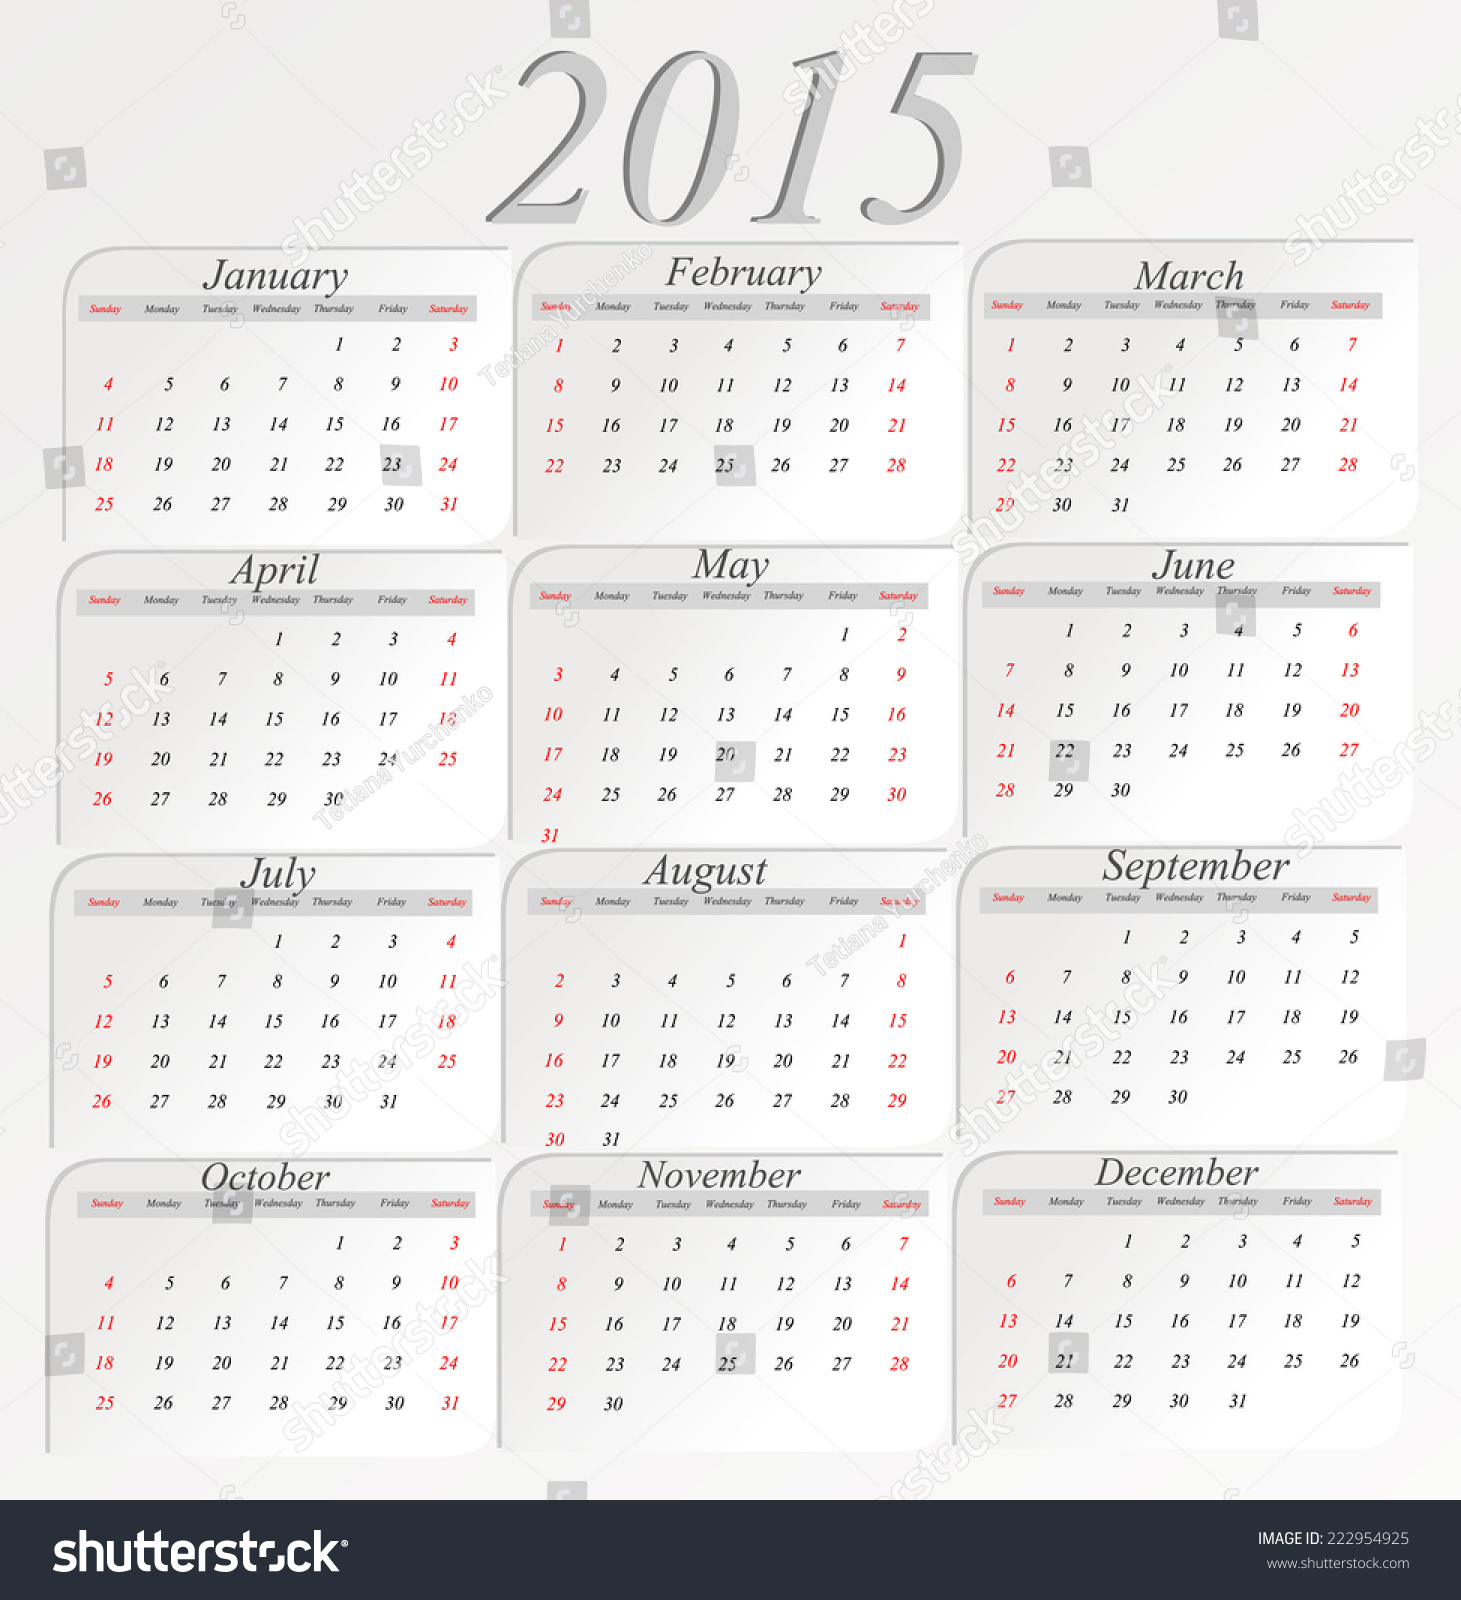 Vertical Calendar Design : Calendar design vertical stock